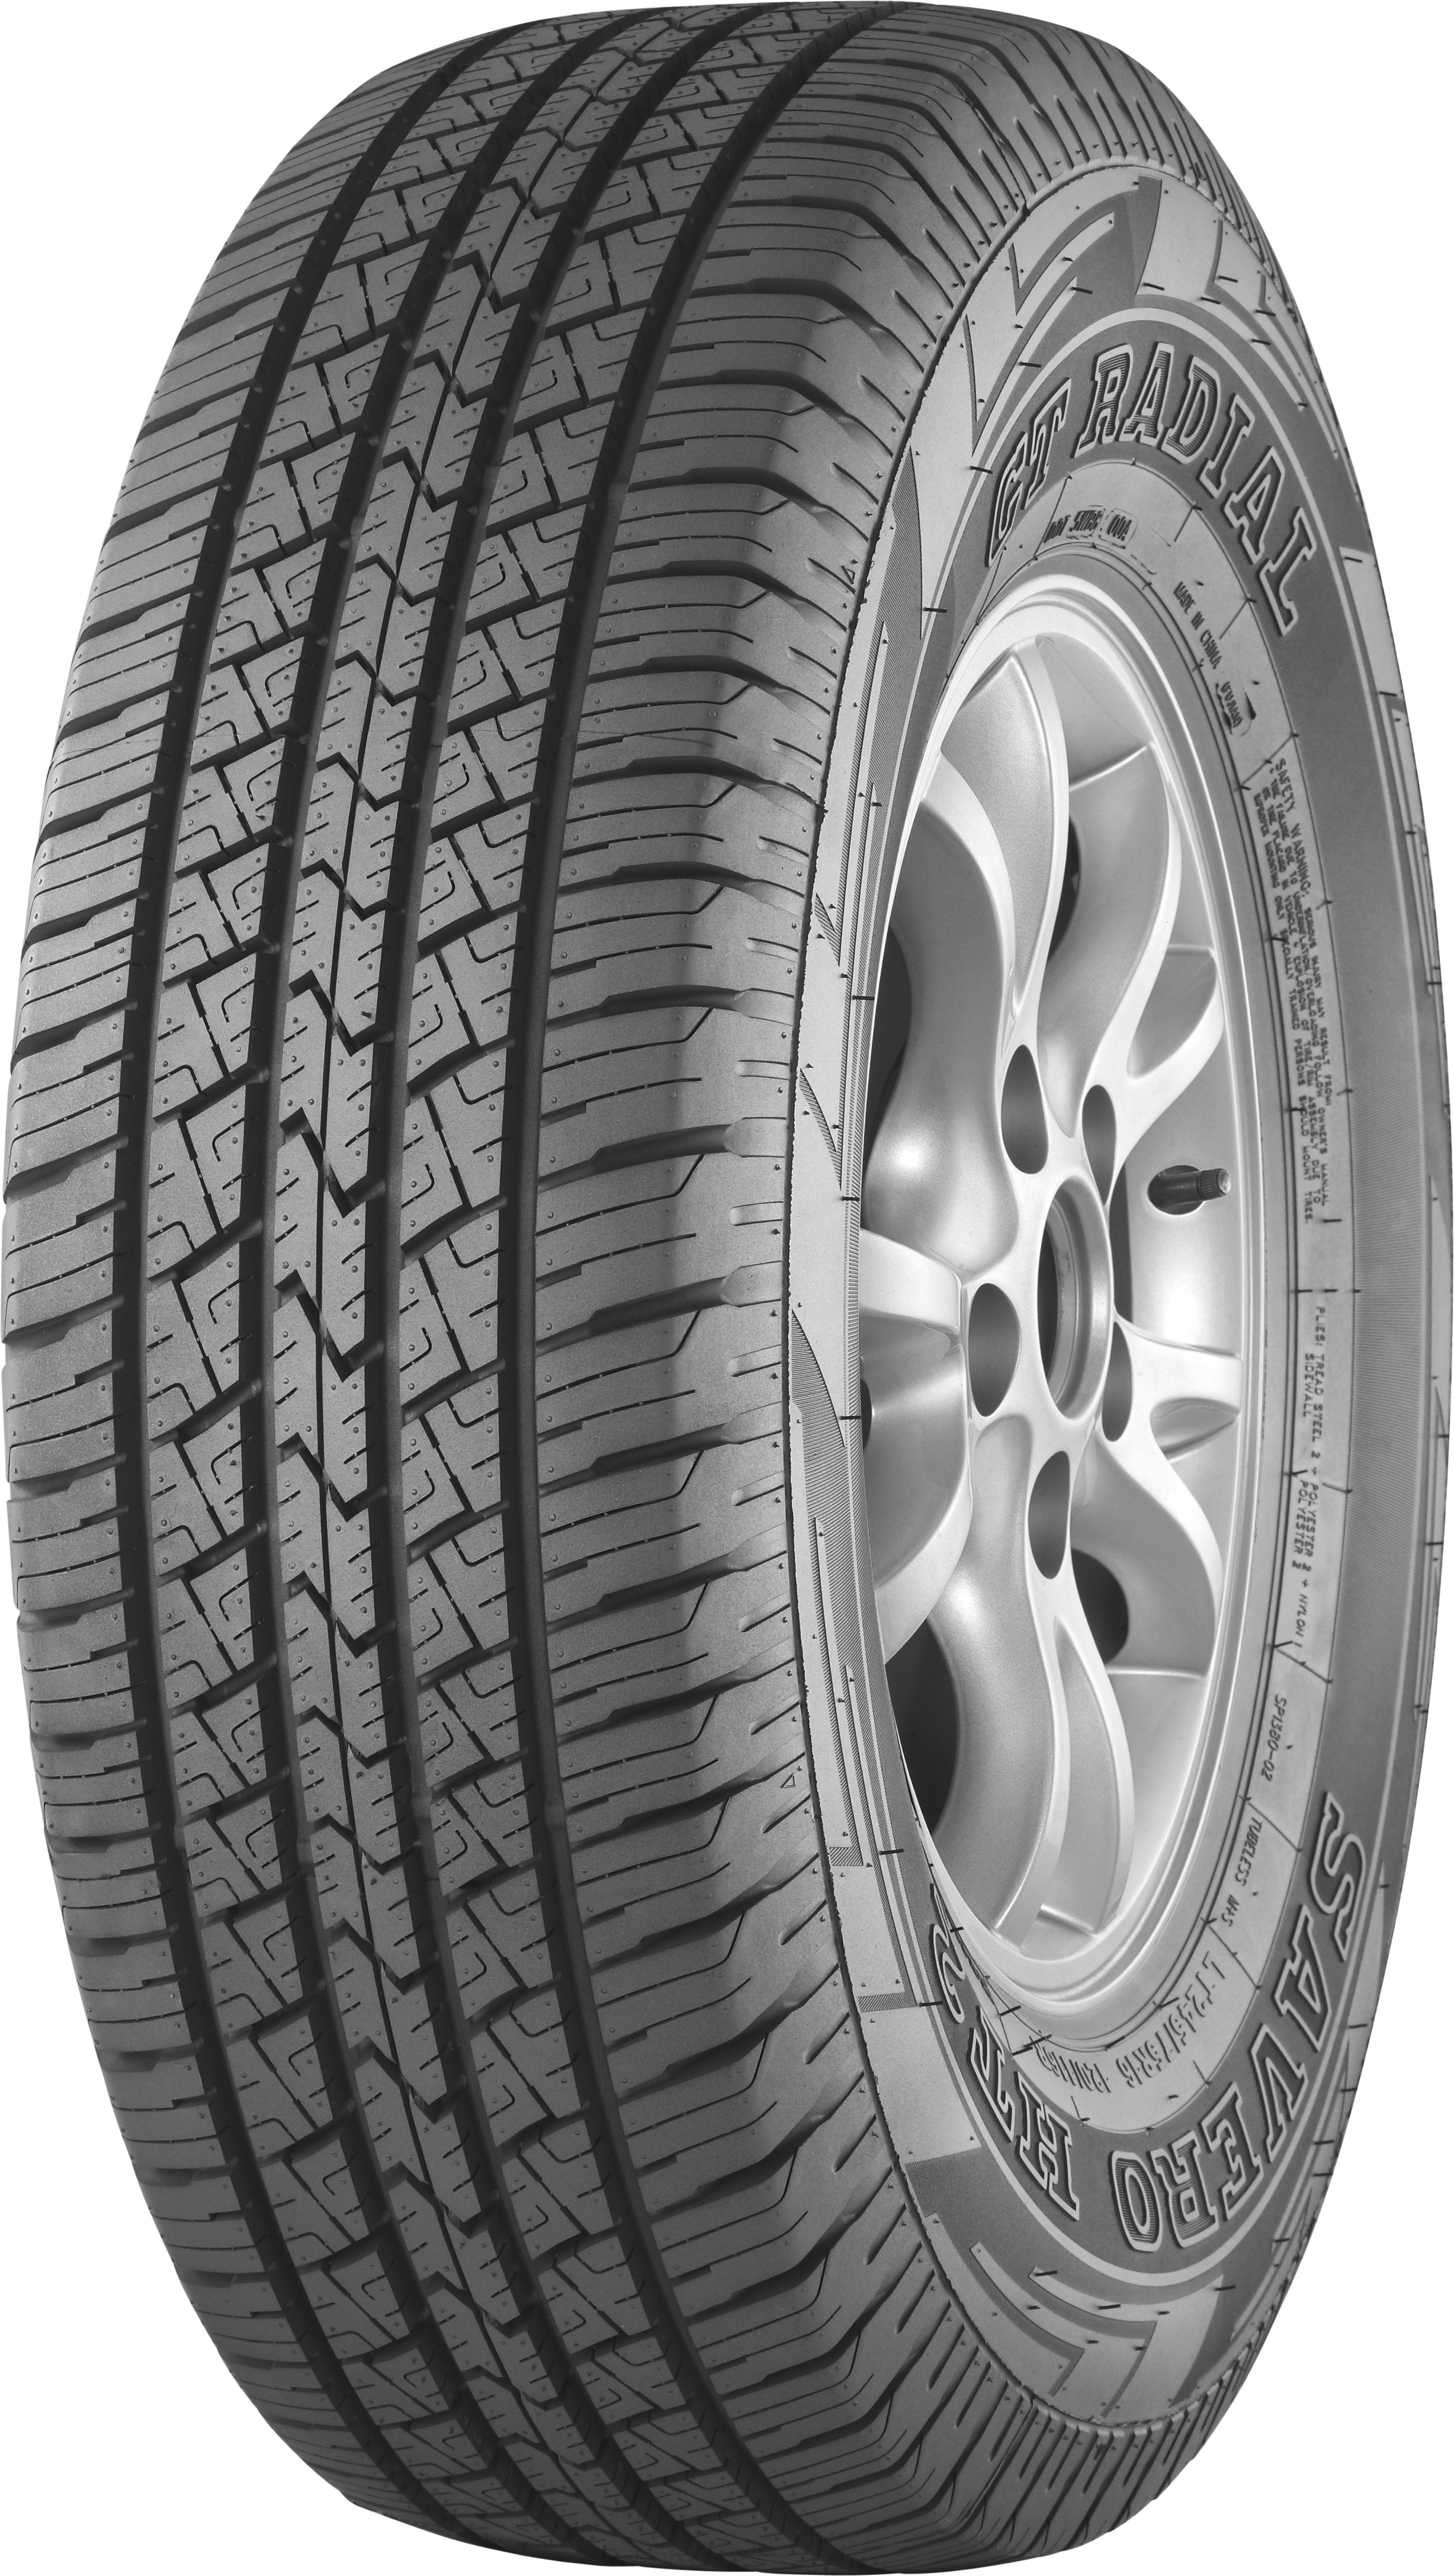 Gt Radial Tires >> SAVERO HT2